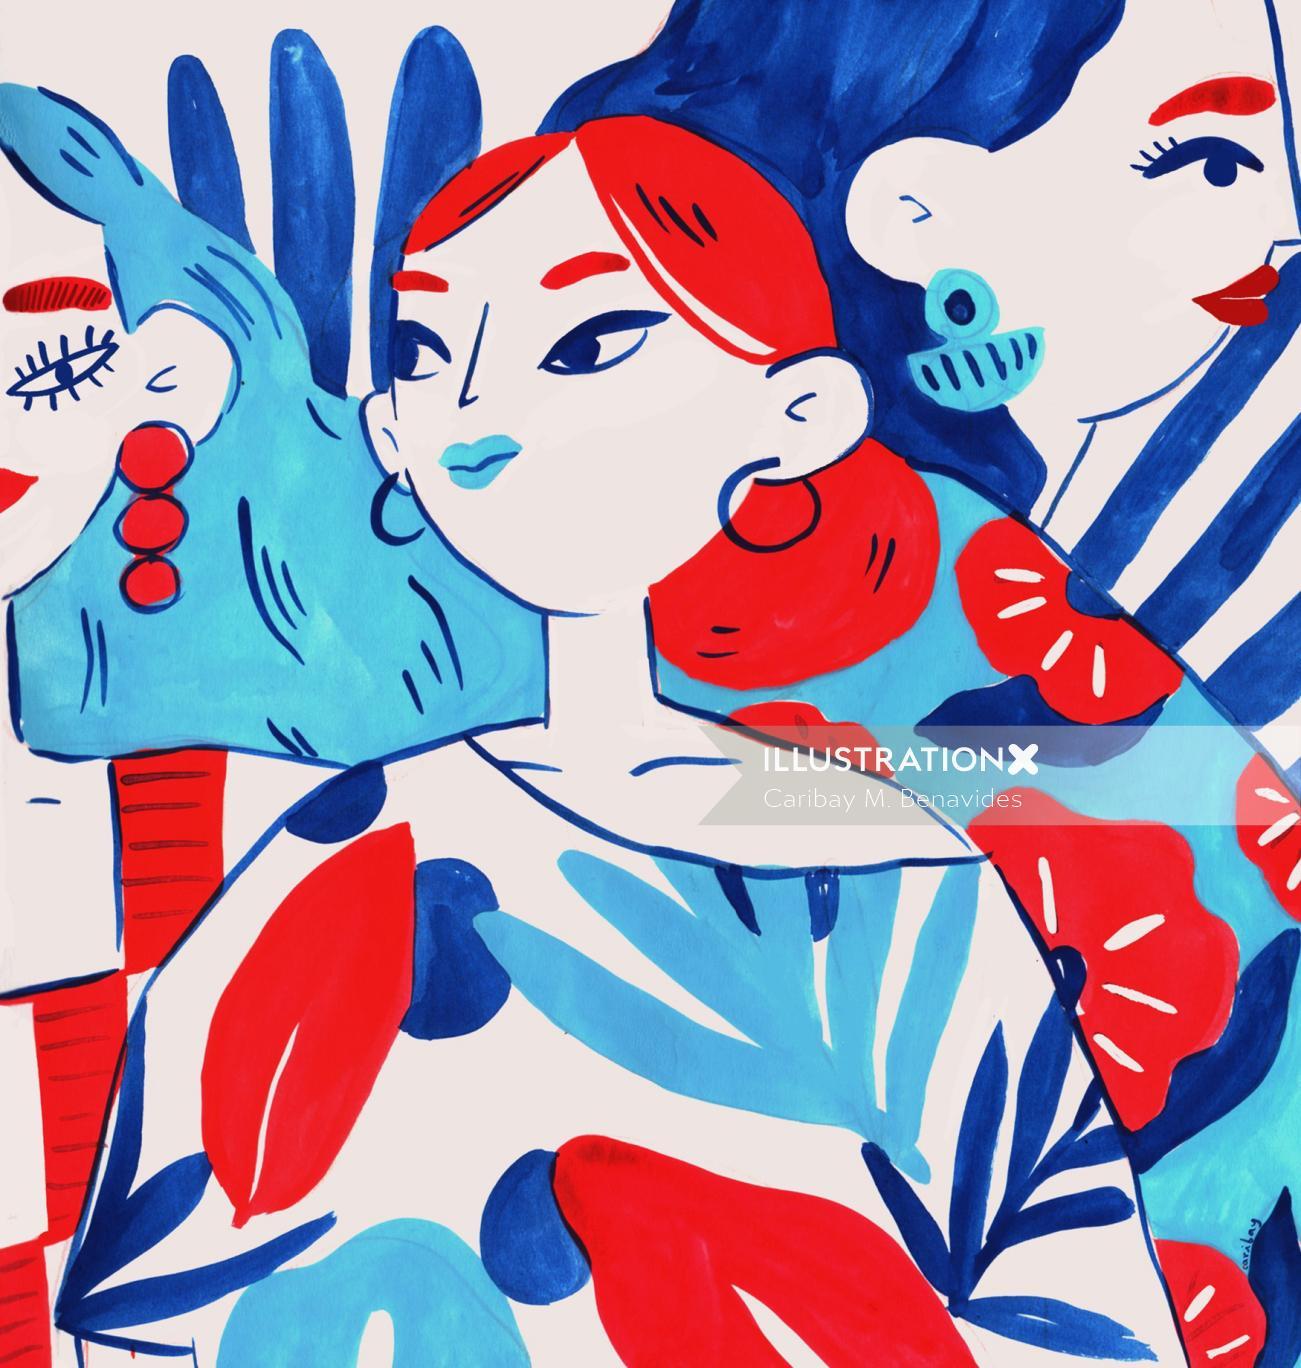 Floral fashion illustration by Caribay M. Benavides